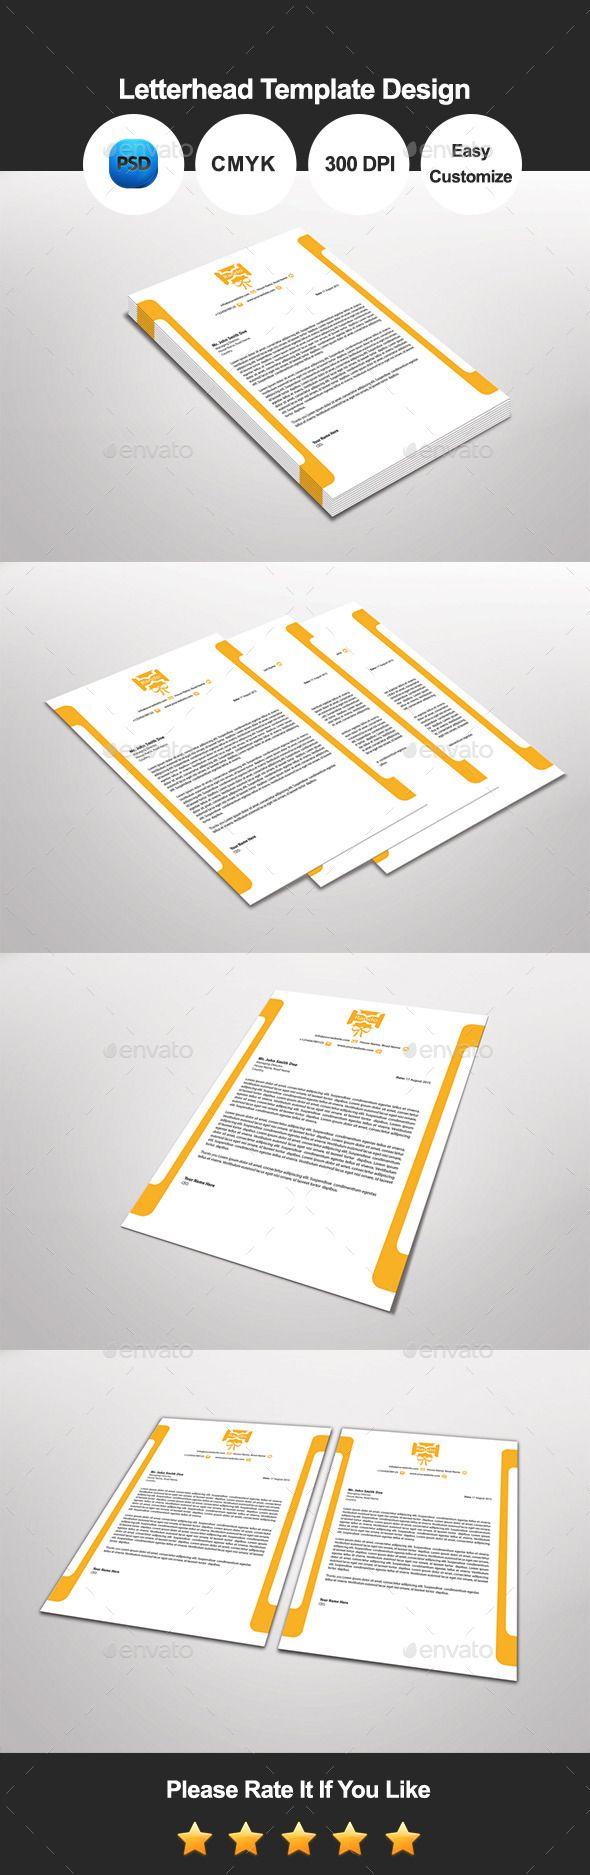 Rando letterhead template design letterhead template font logo rando letterhead template design photoshop psd letter pad modern available here spiritdancerdesigns Images